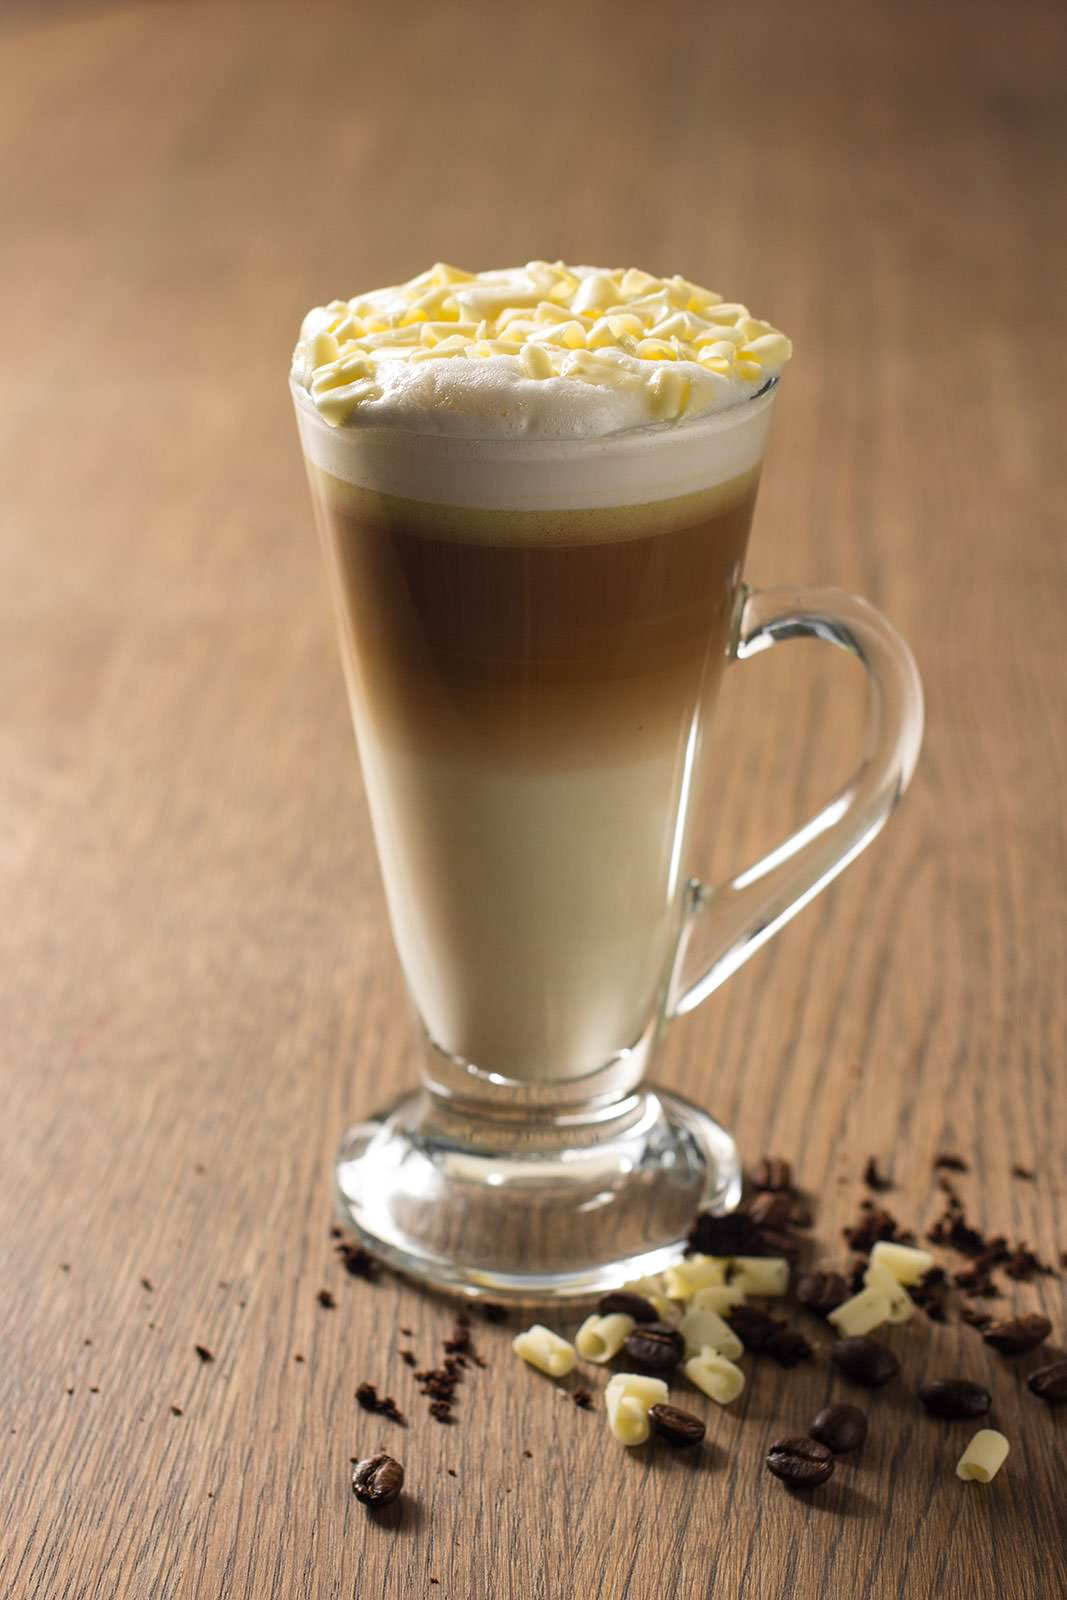 White Chocolate Mocca - Hot